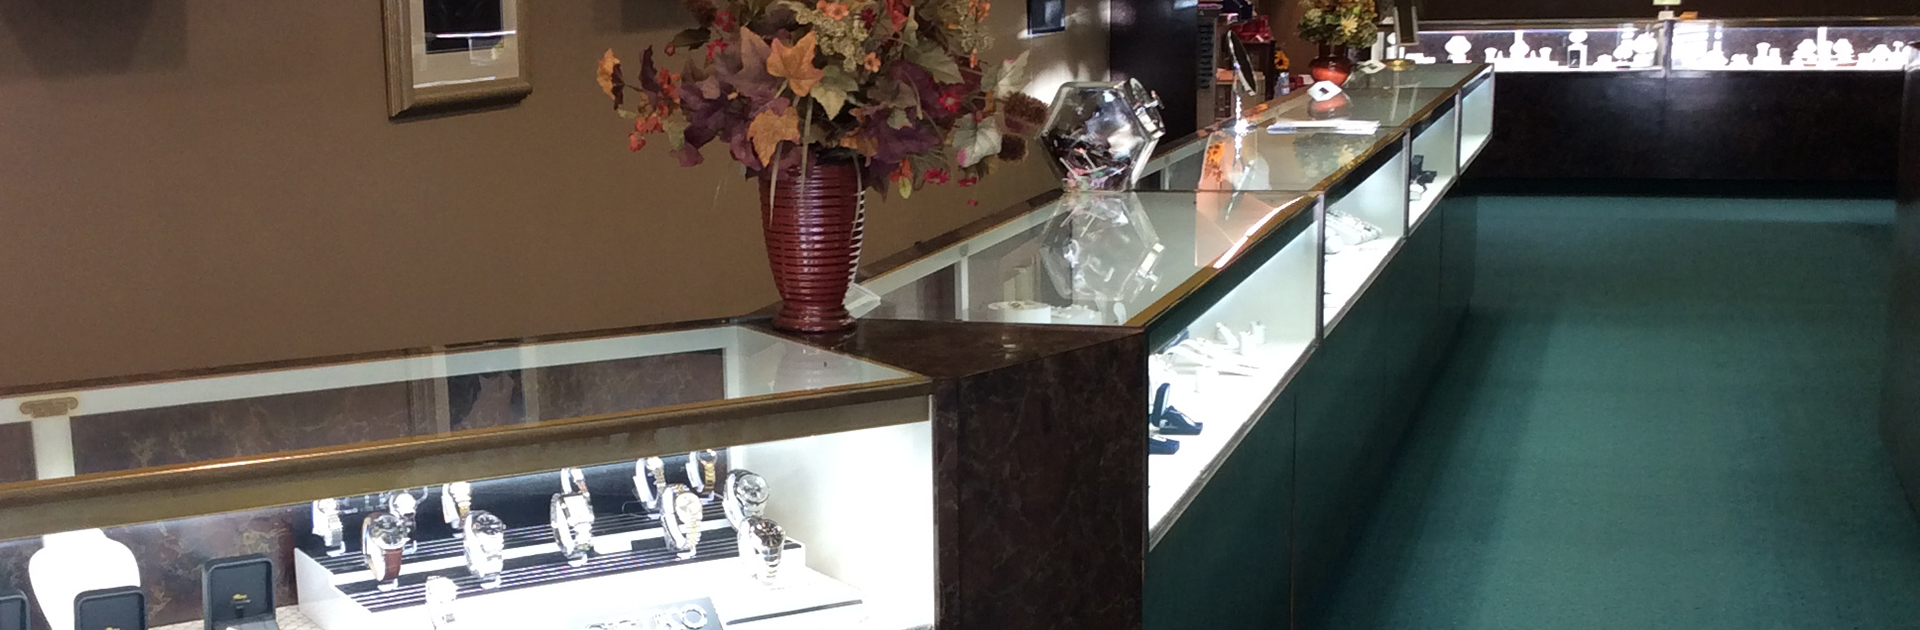 Plaza Jewelry Counter